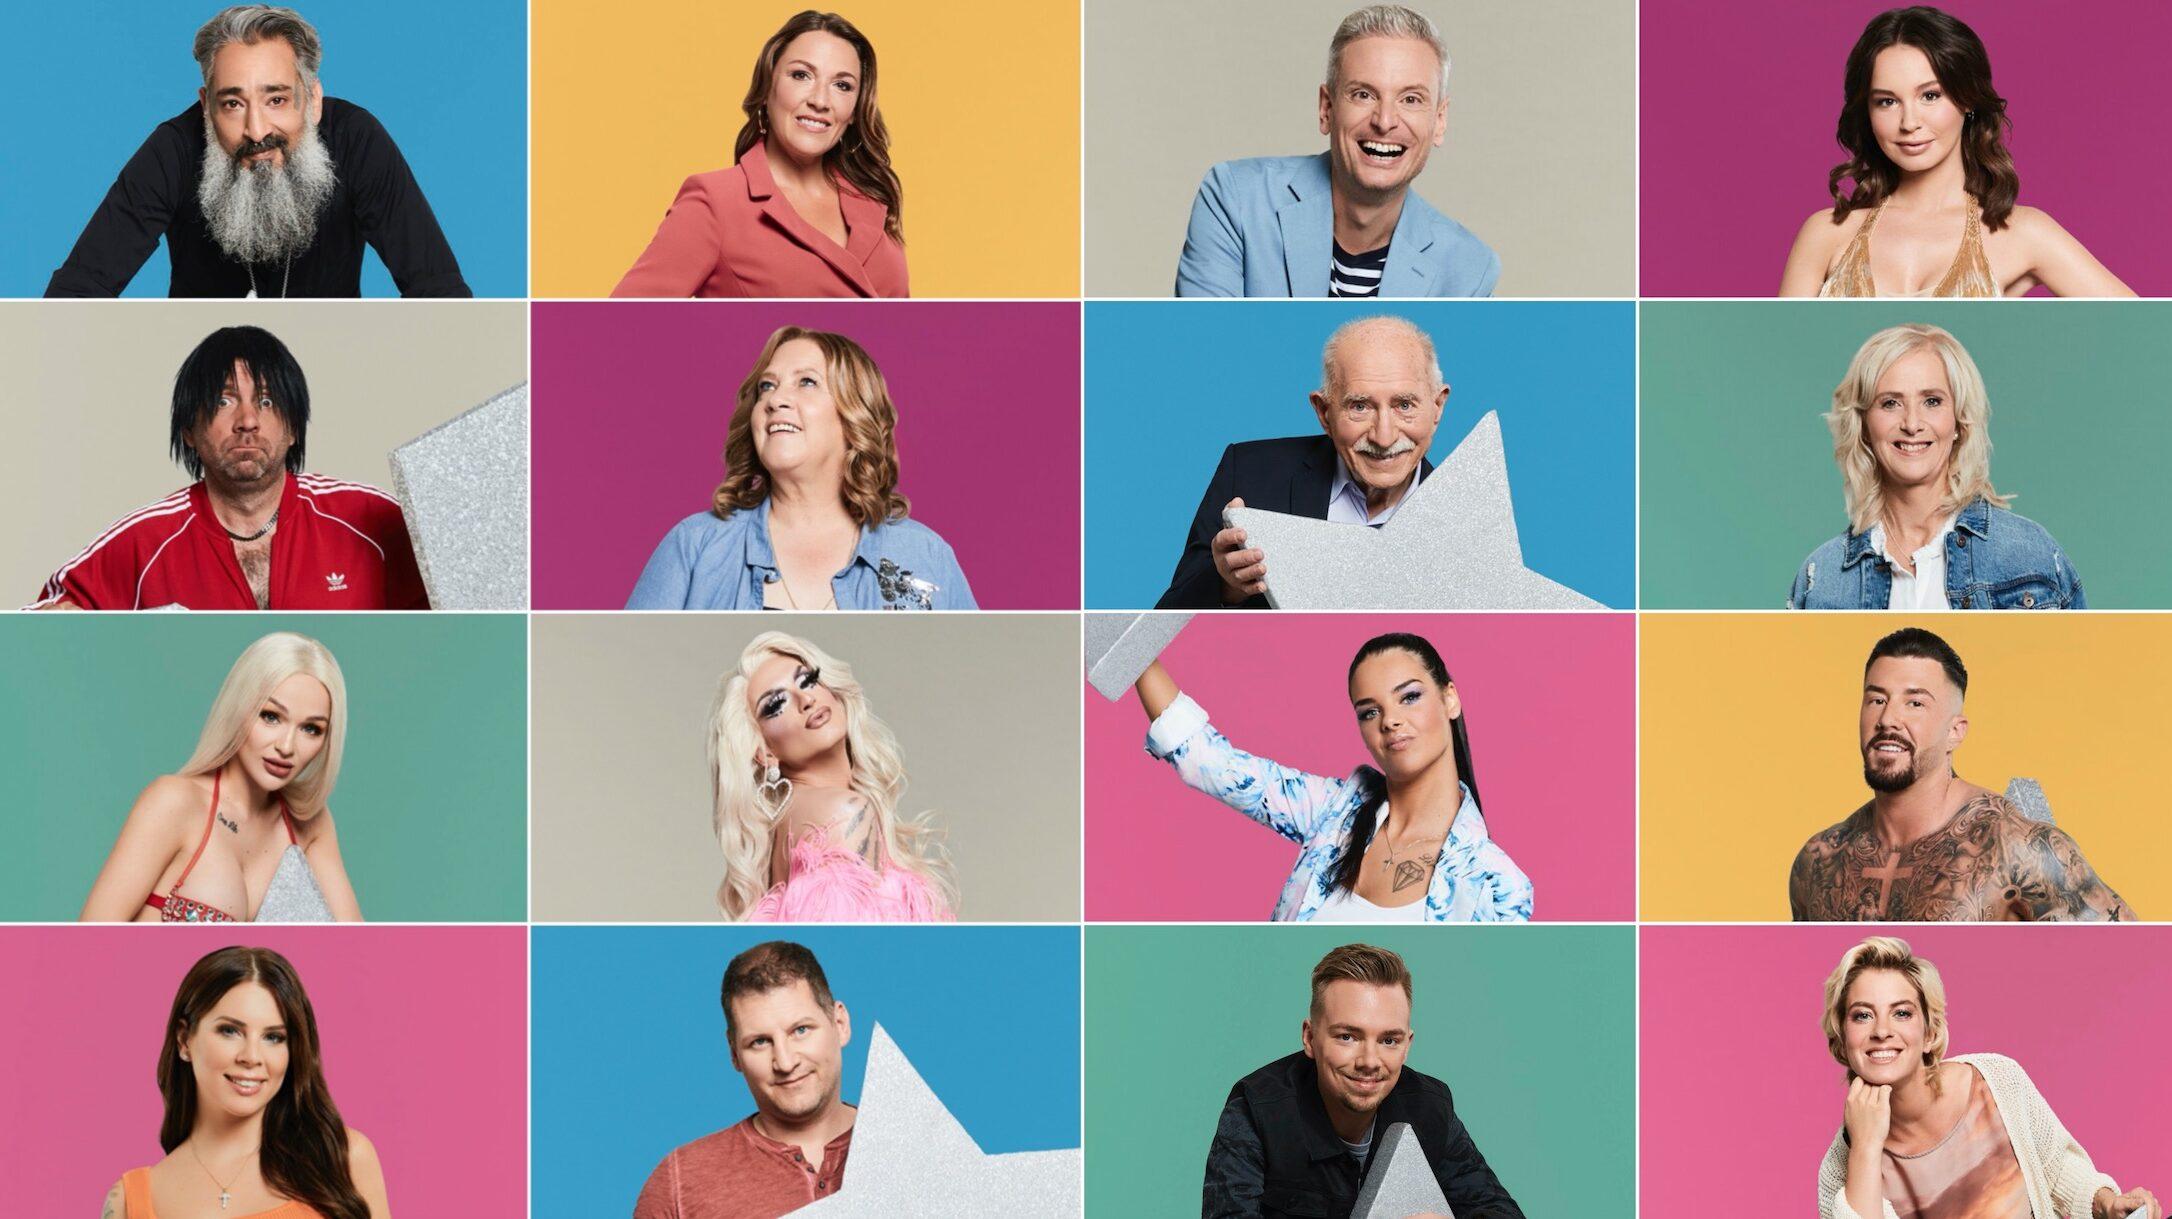 Promi Big Brother 2020 Kandidaten heute: Alle 16